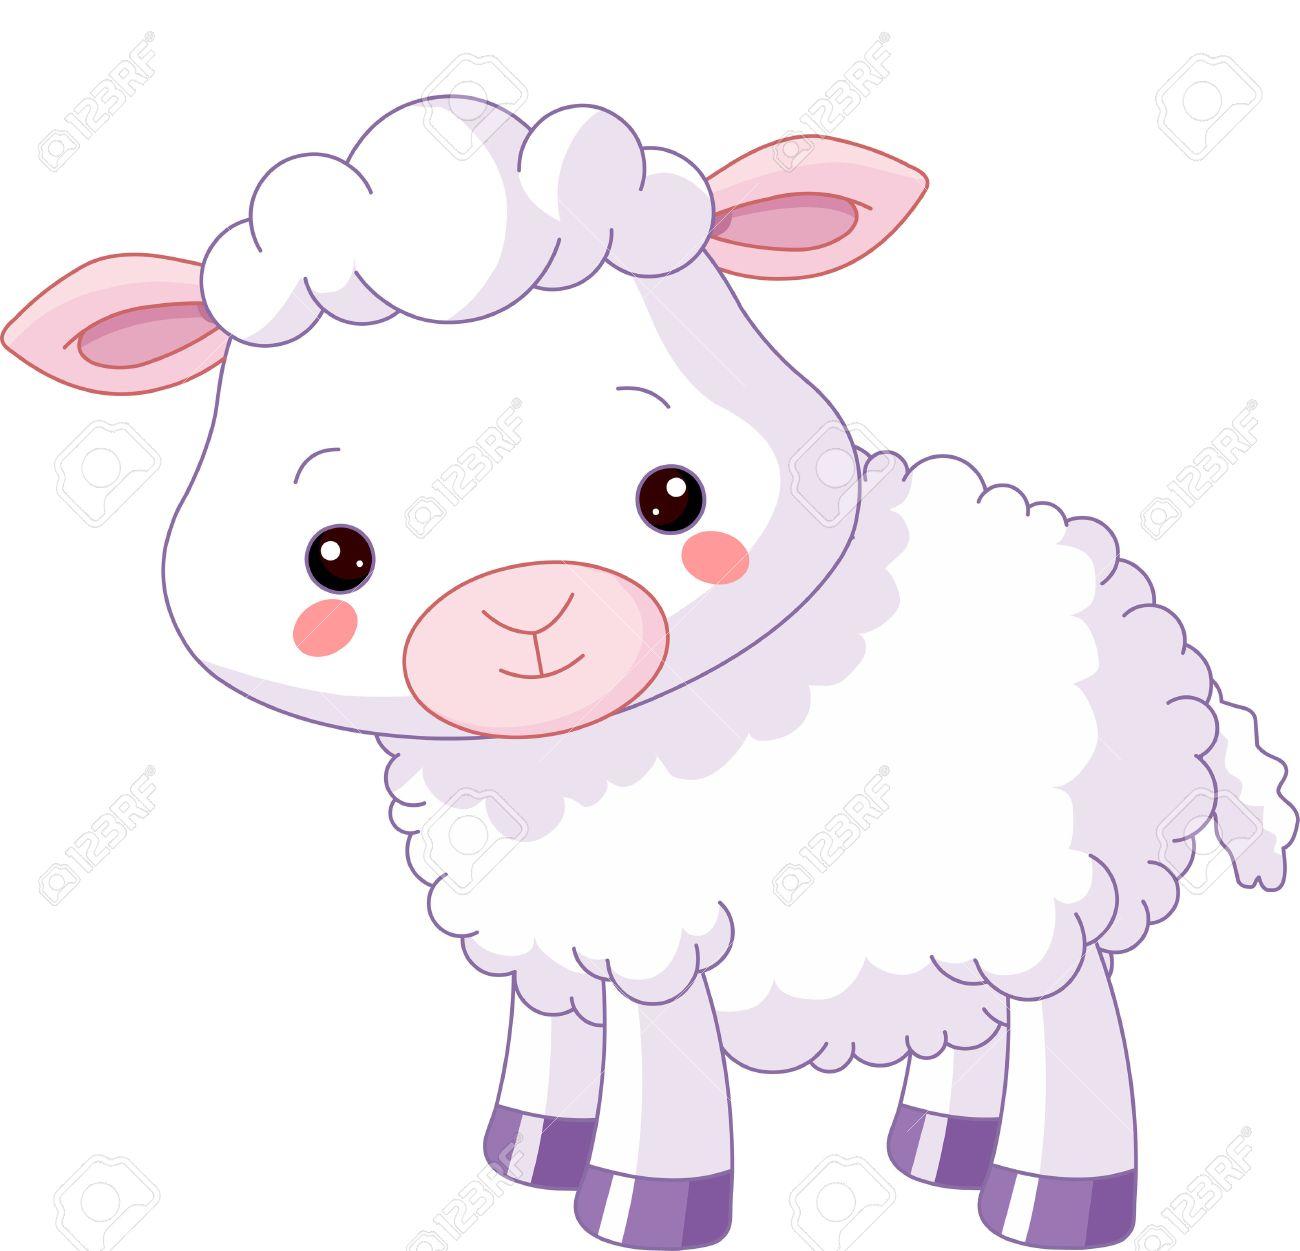 Baby Farm Animals Clip Art farm animals. illustration of cute lamb royalty free cliparts